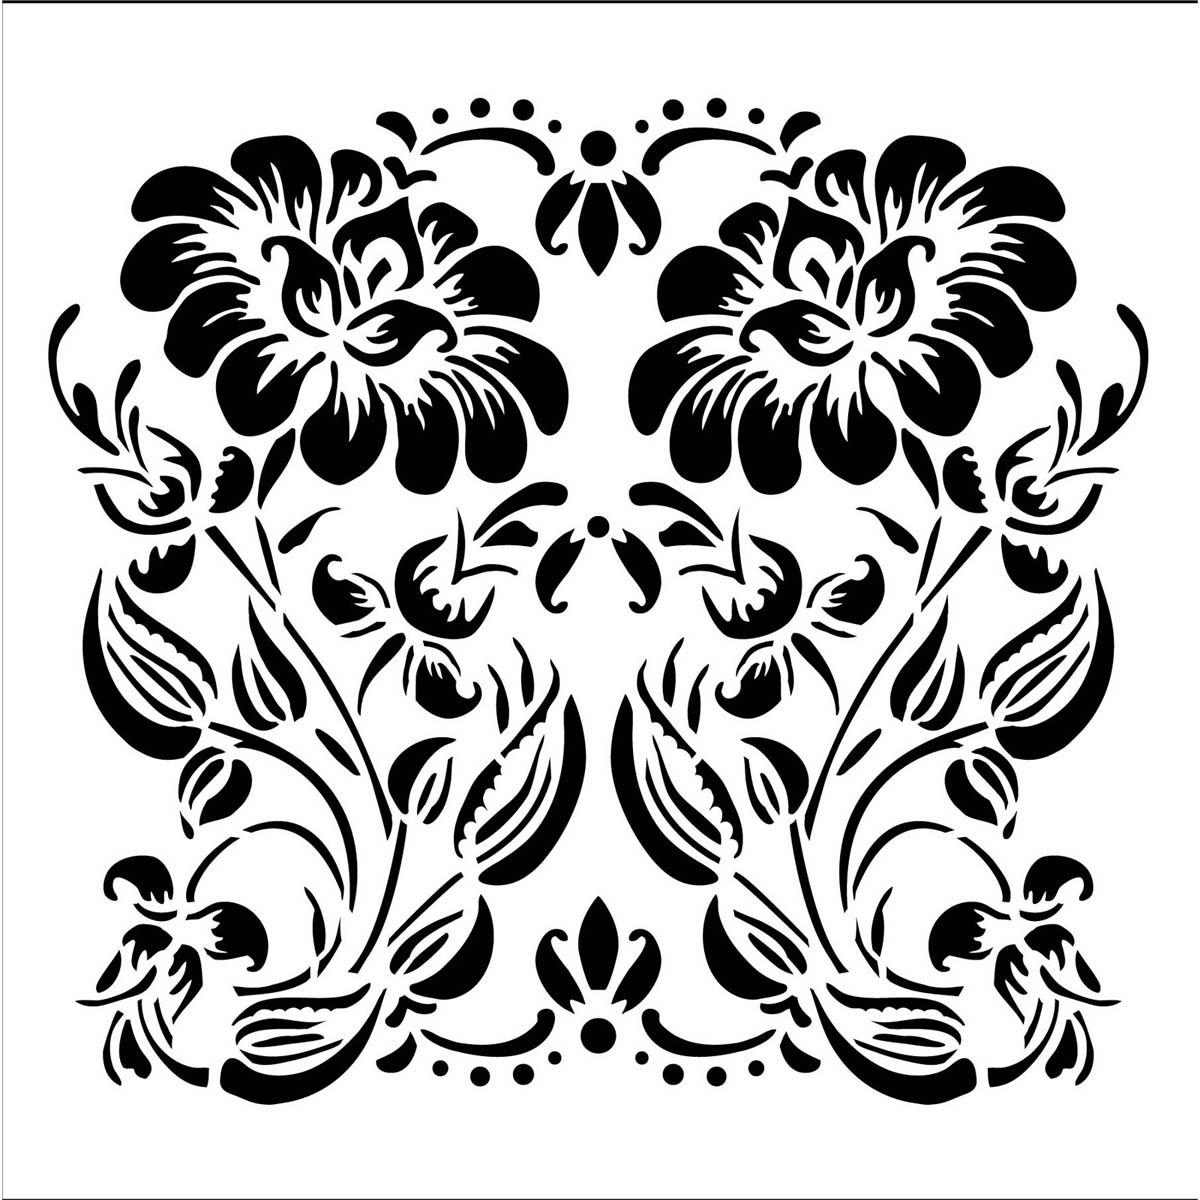 FolkArt ® Painting Stencils - Small - Ornamental Flower - 31476